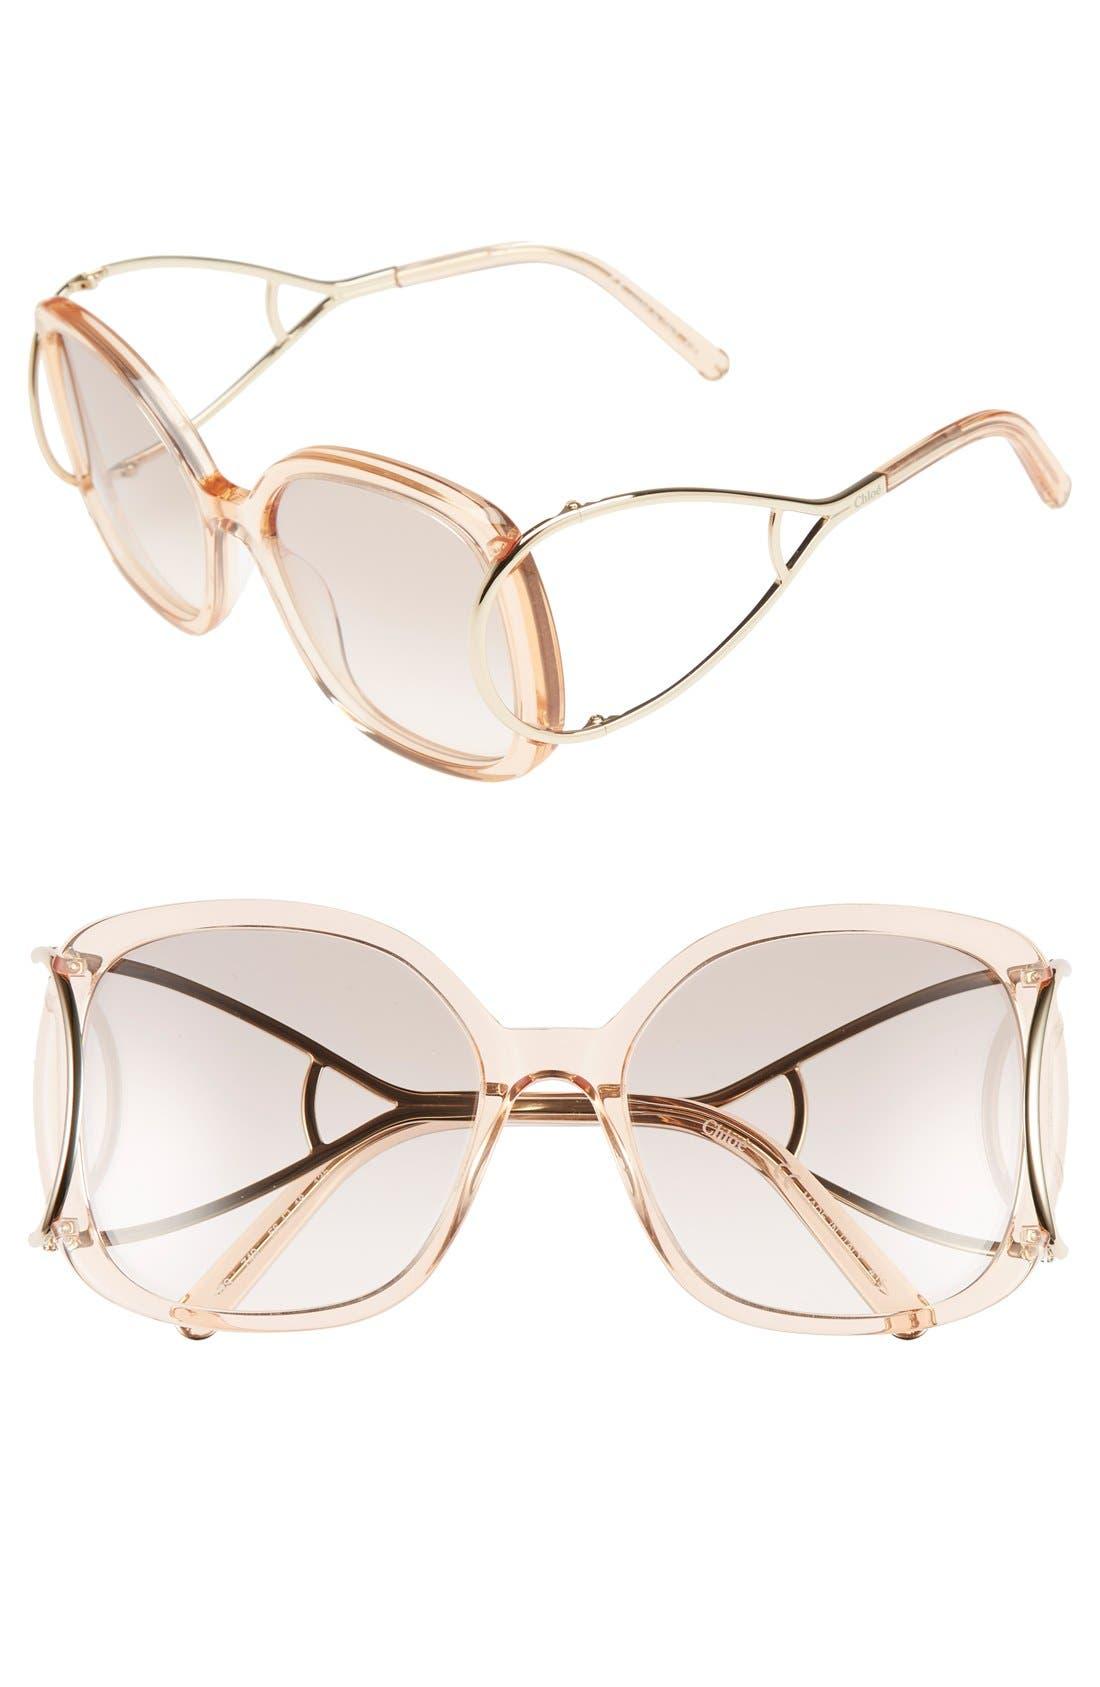 Chloé 'Jackson' 56mm Square Sunglasses